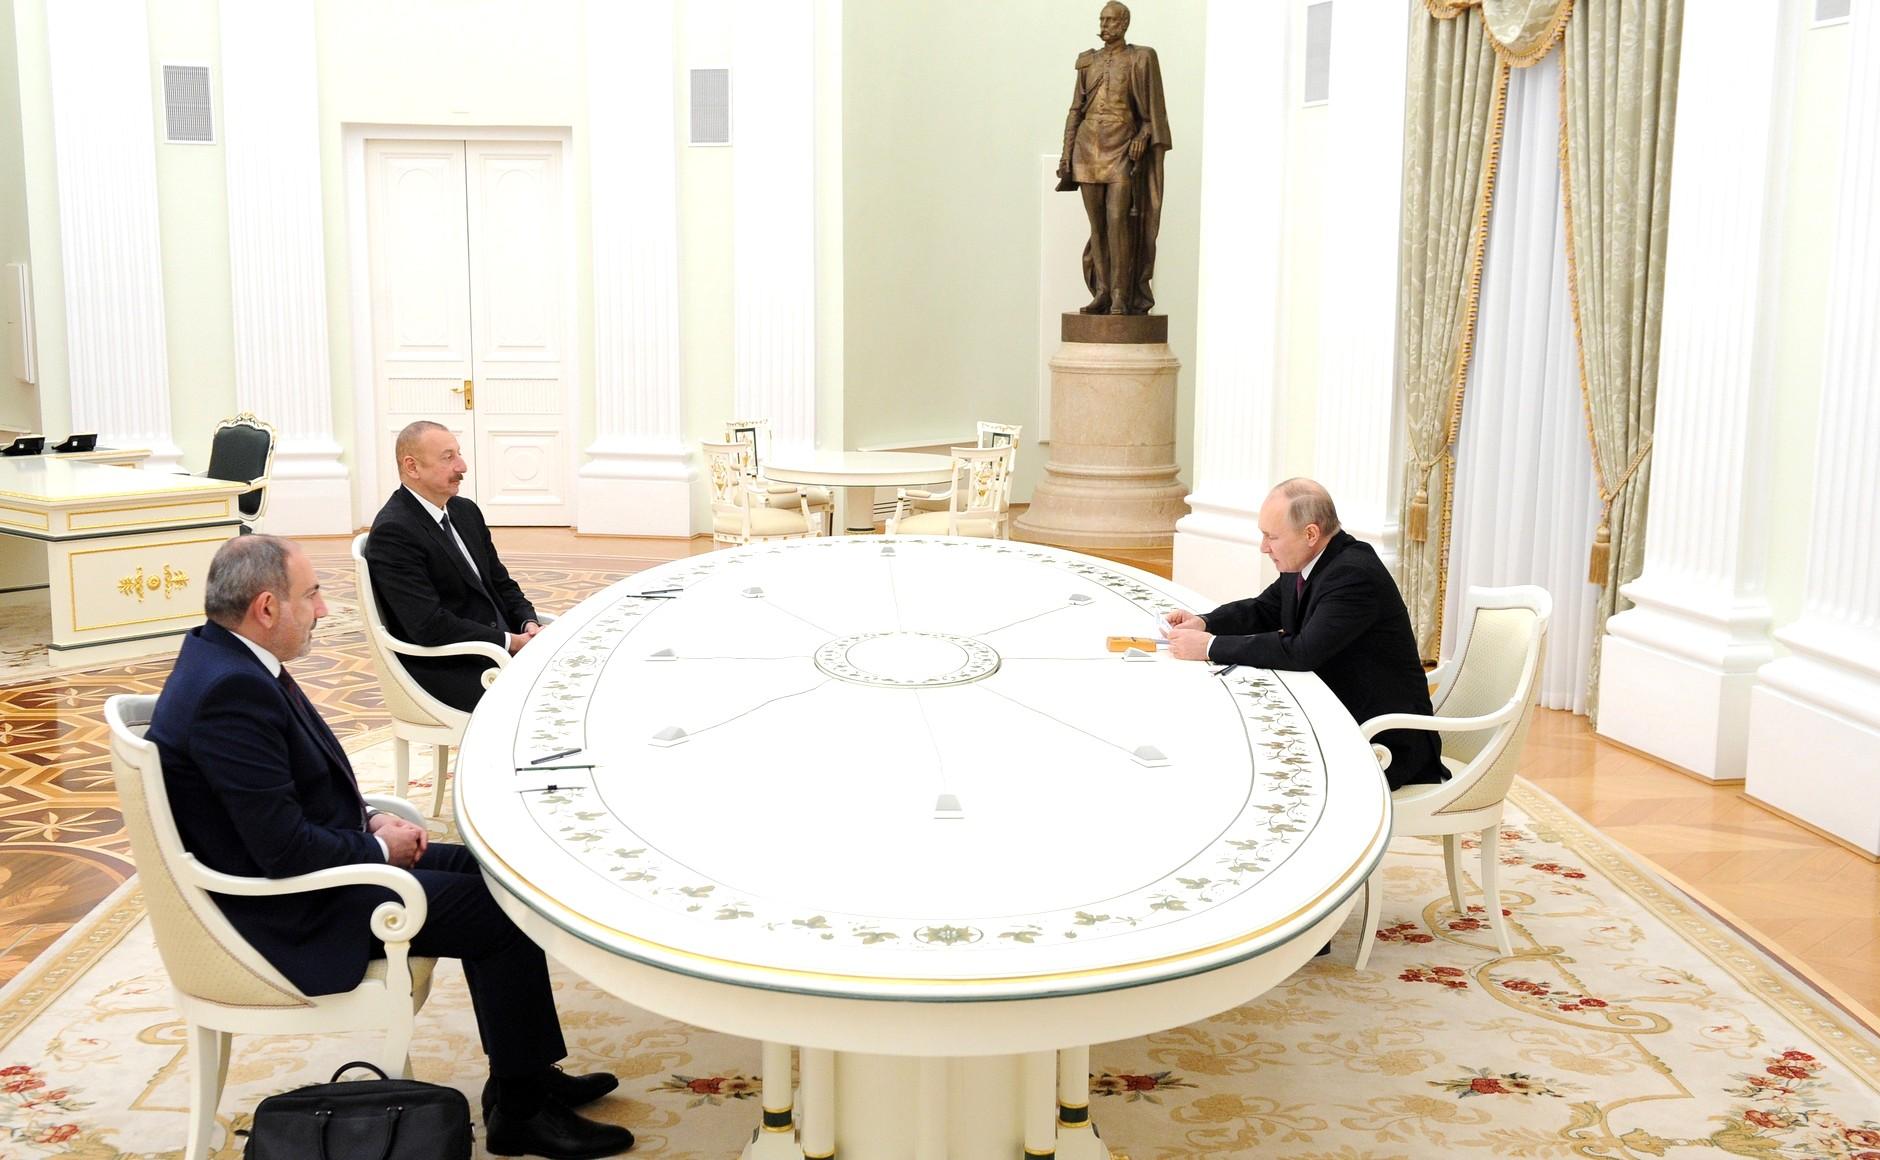 KREMLIN PH 3 XX 3 Rencontre avec Ilham Aliyev et Nikol Pashinyan - 11 janvier 2021 - 17H40